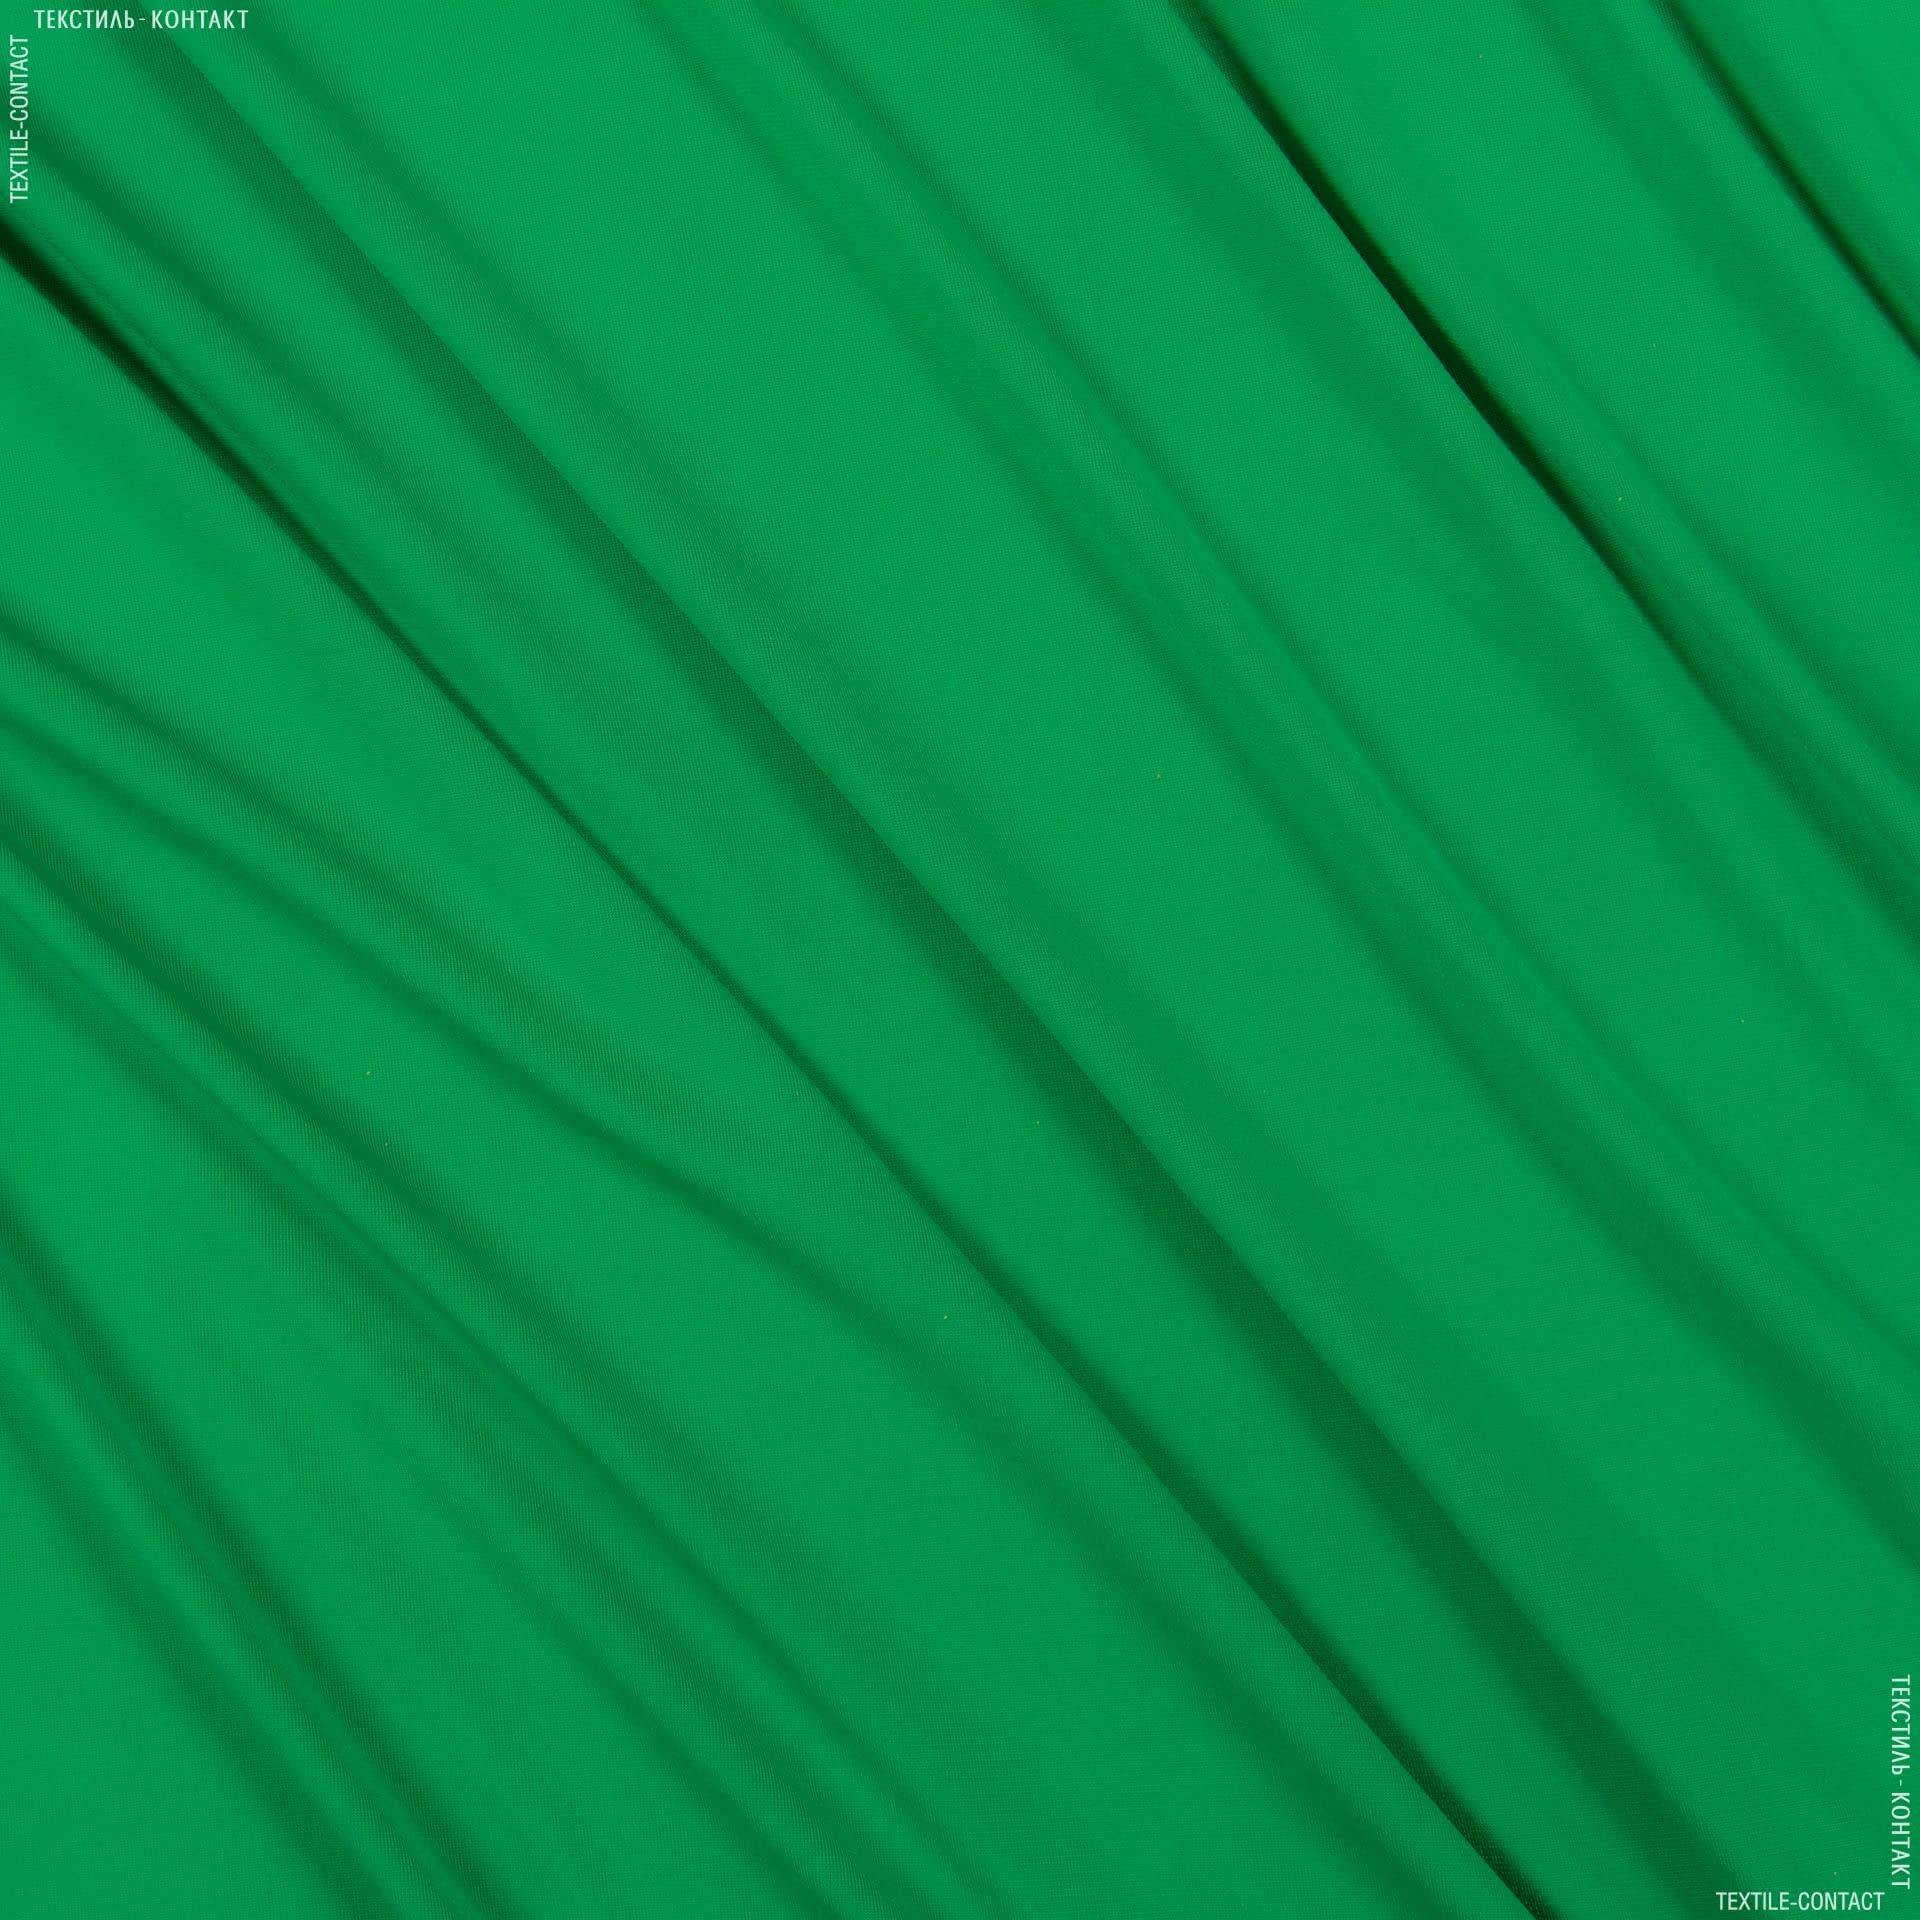 Тканини для суконь - Трикотаж масло зелений